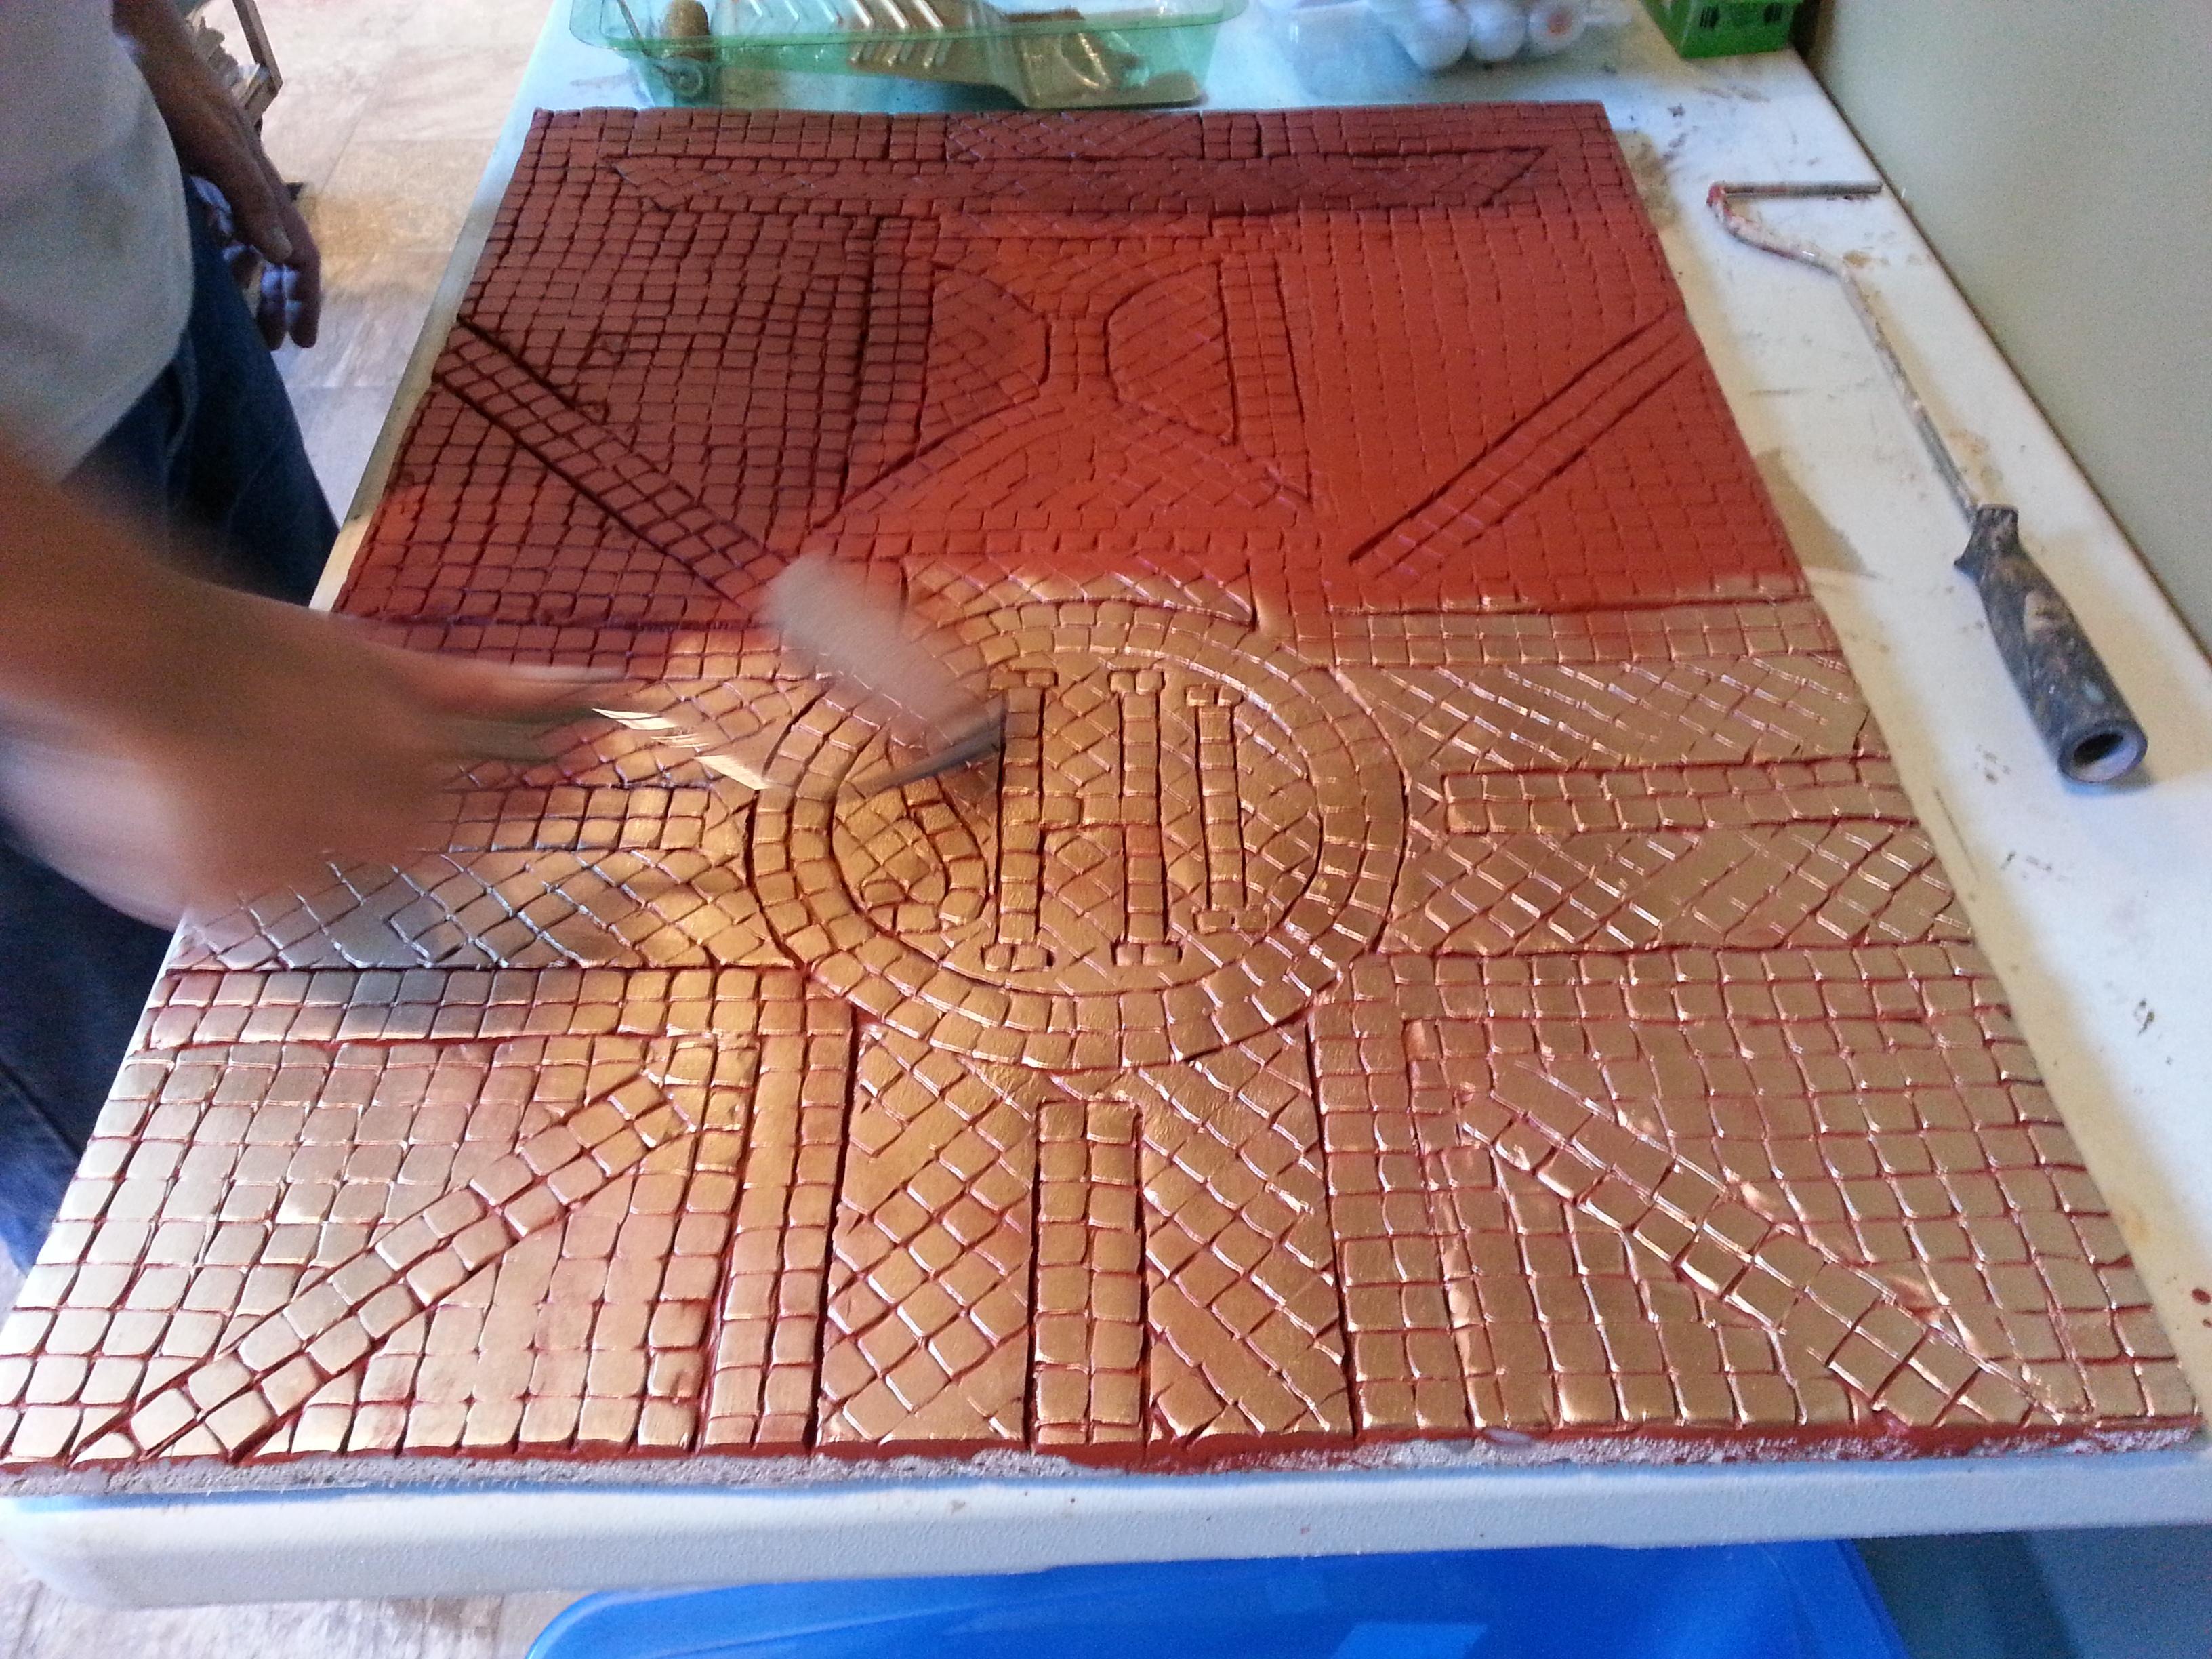 FPDR mosaic restoration